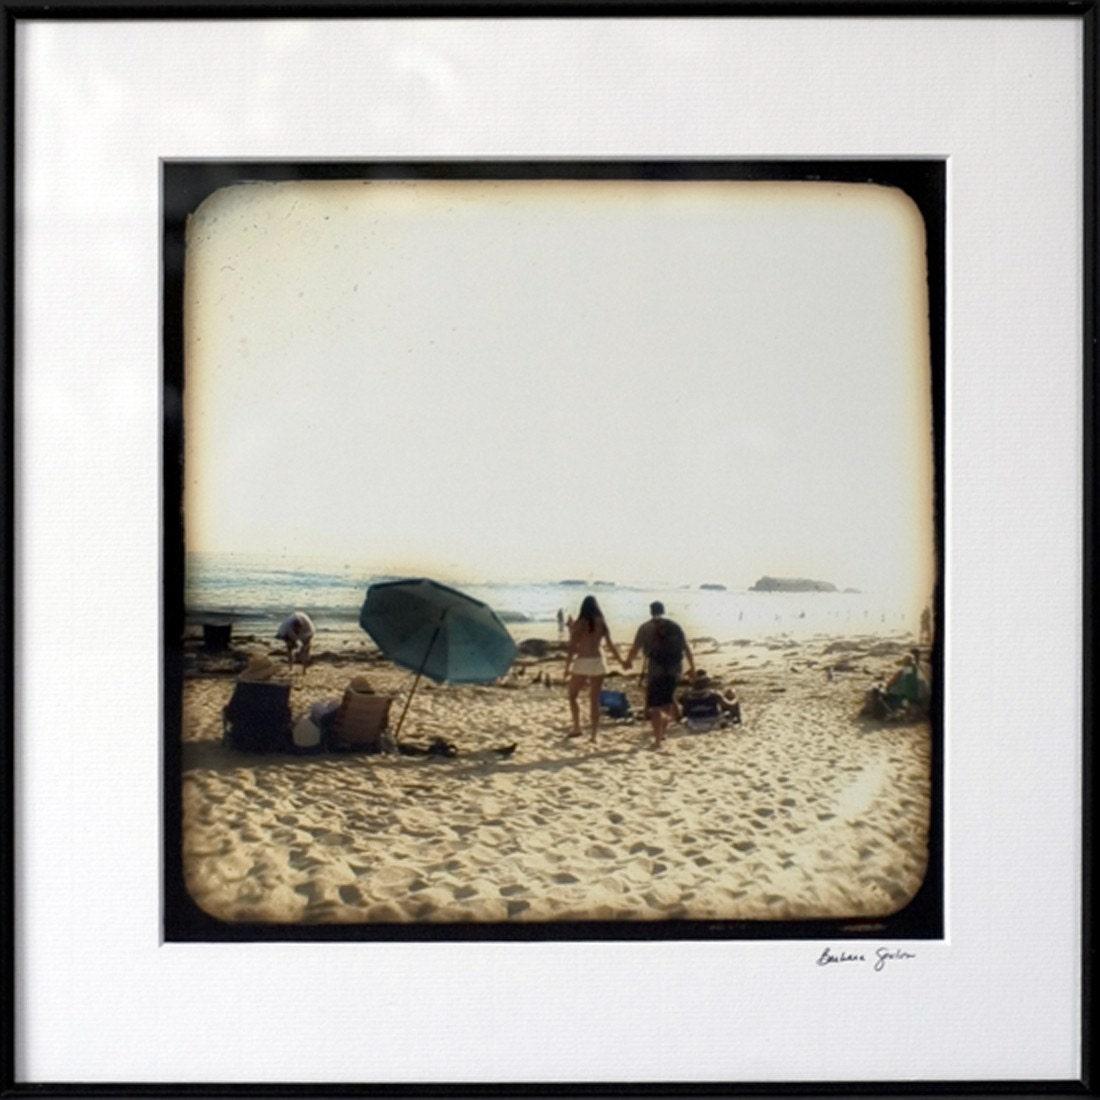 Beach Couple - 8x8 Original Signed Fine Art Photograph Framed - FREE U.S. SHIPPING